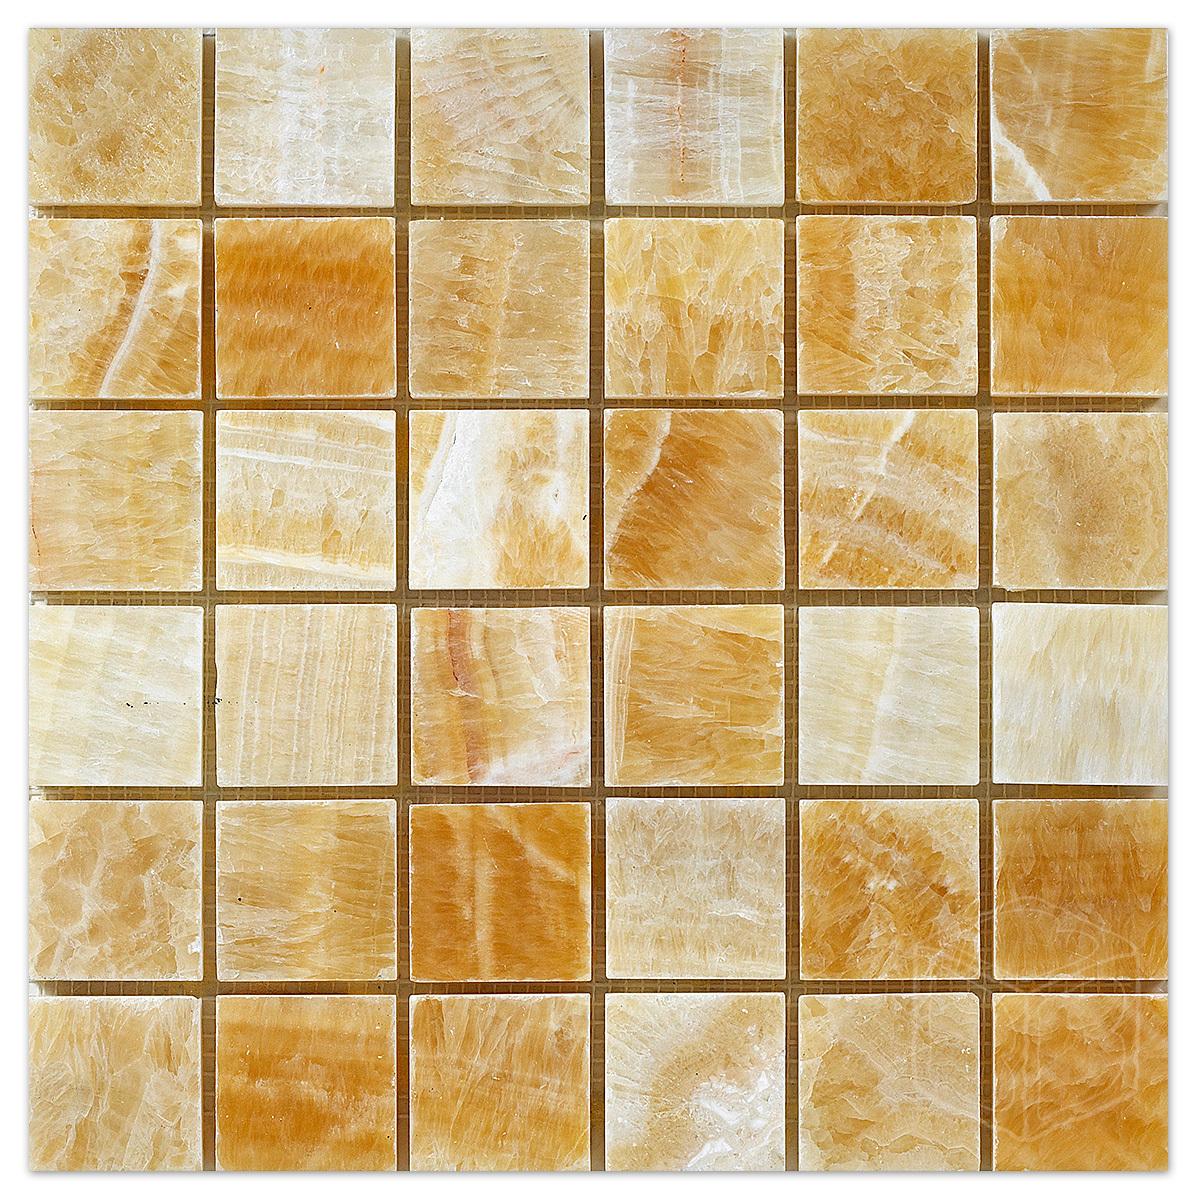 Pineapple Onyx 2x2 Polished Marble Mosaic